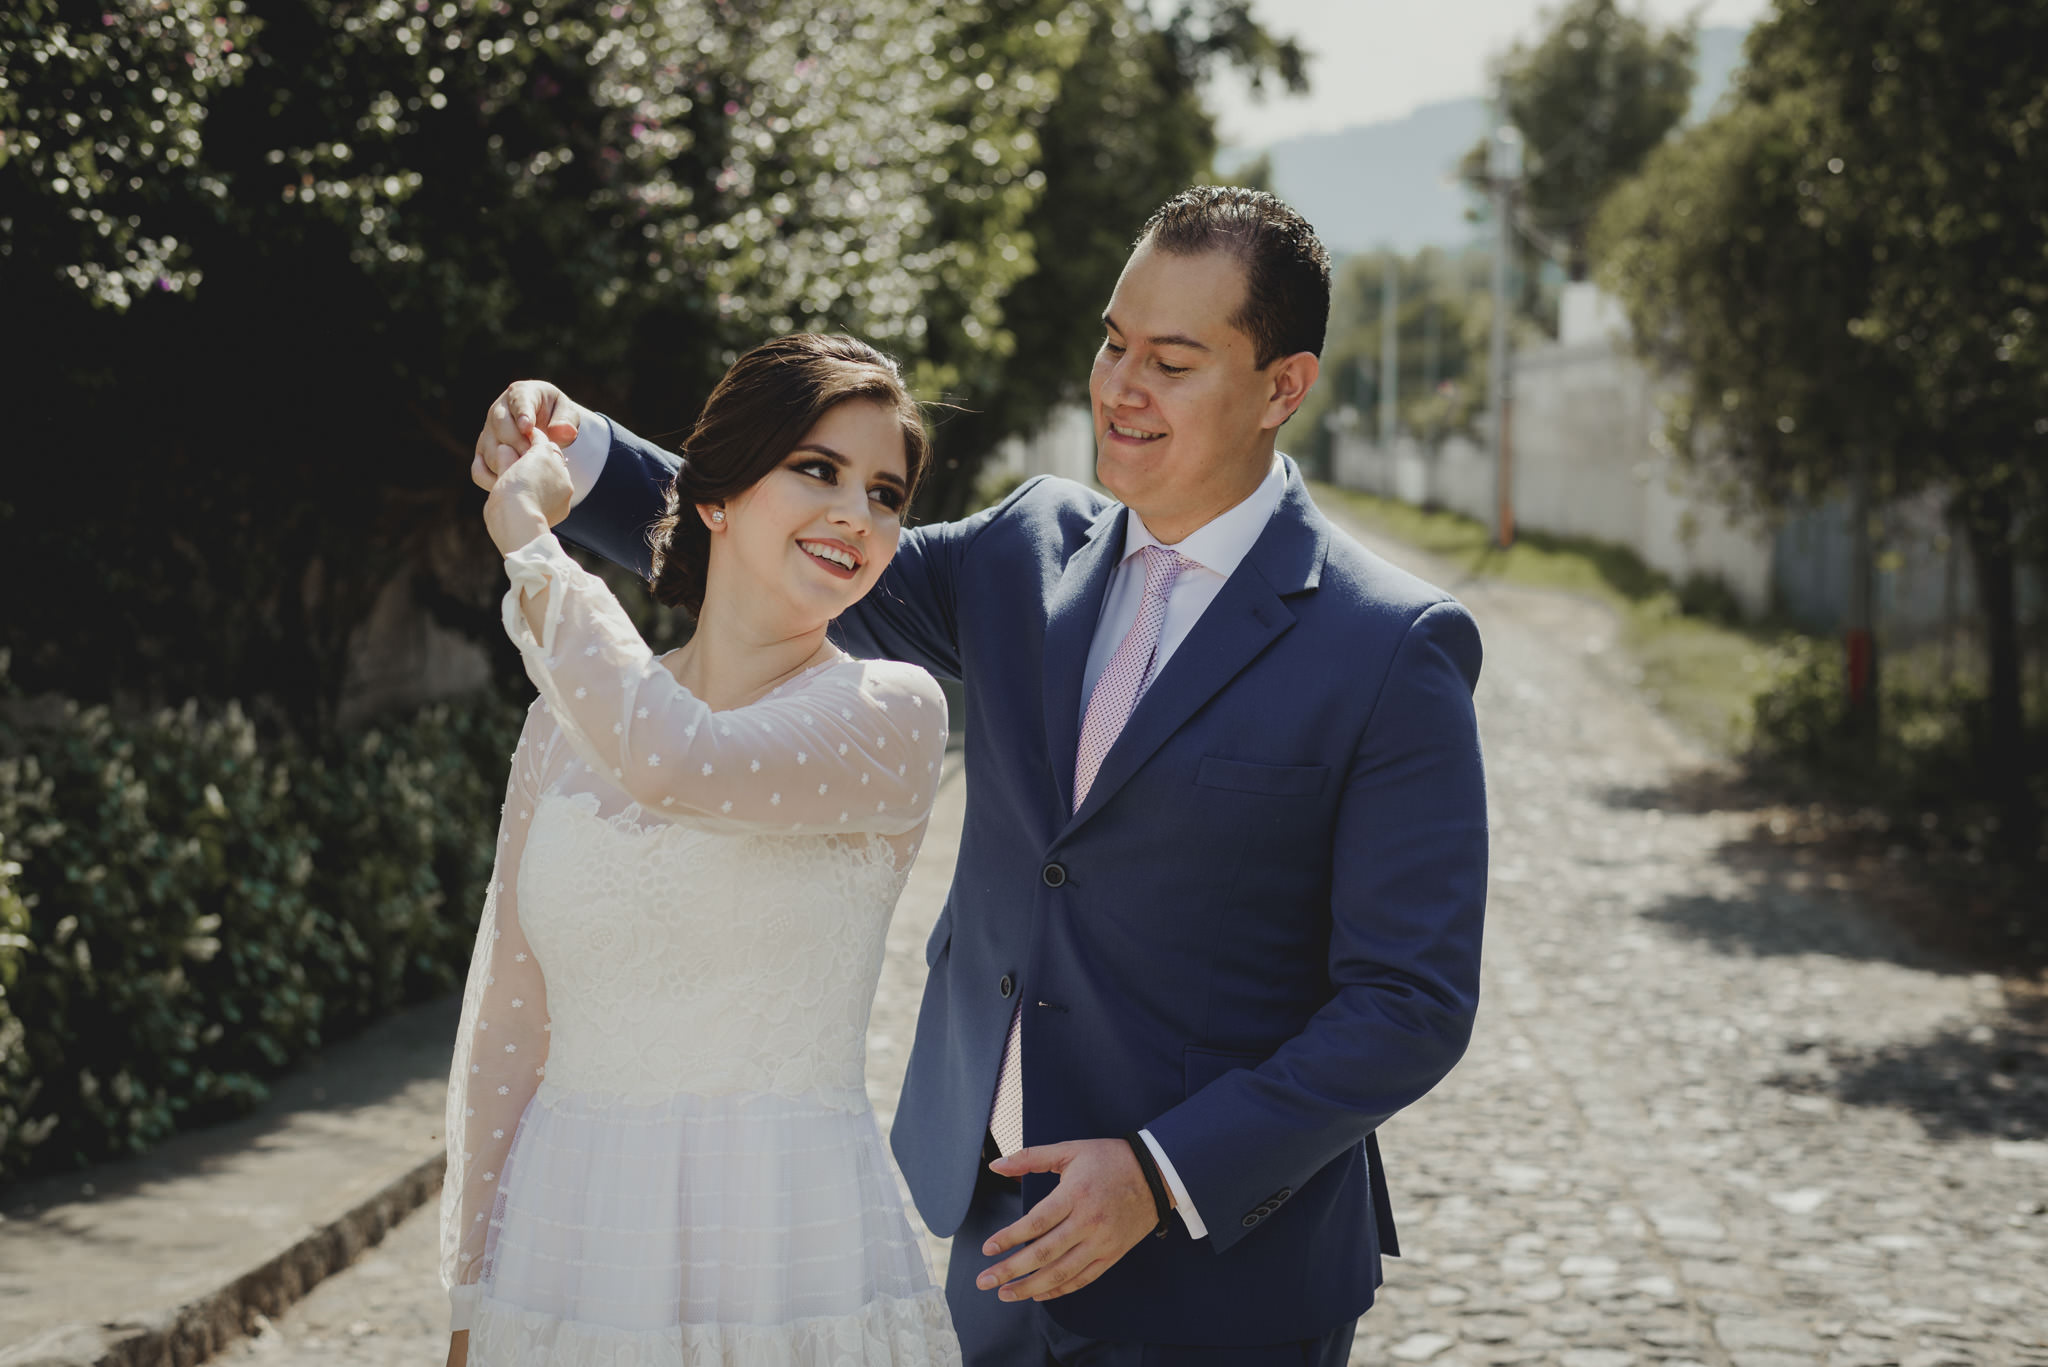 Marcia & Diego: Boda civil en Antigua Guatemala